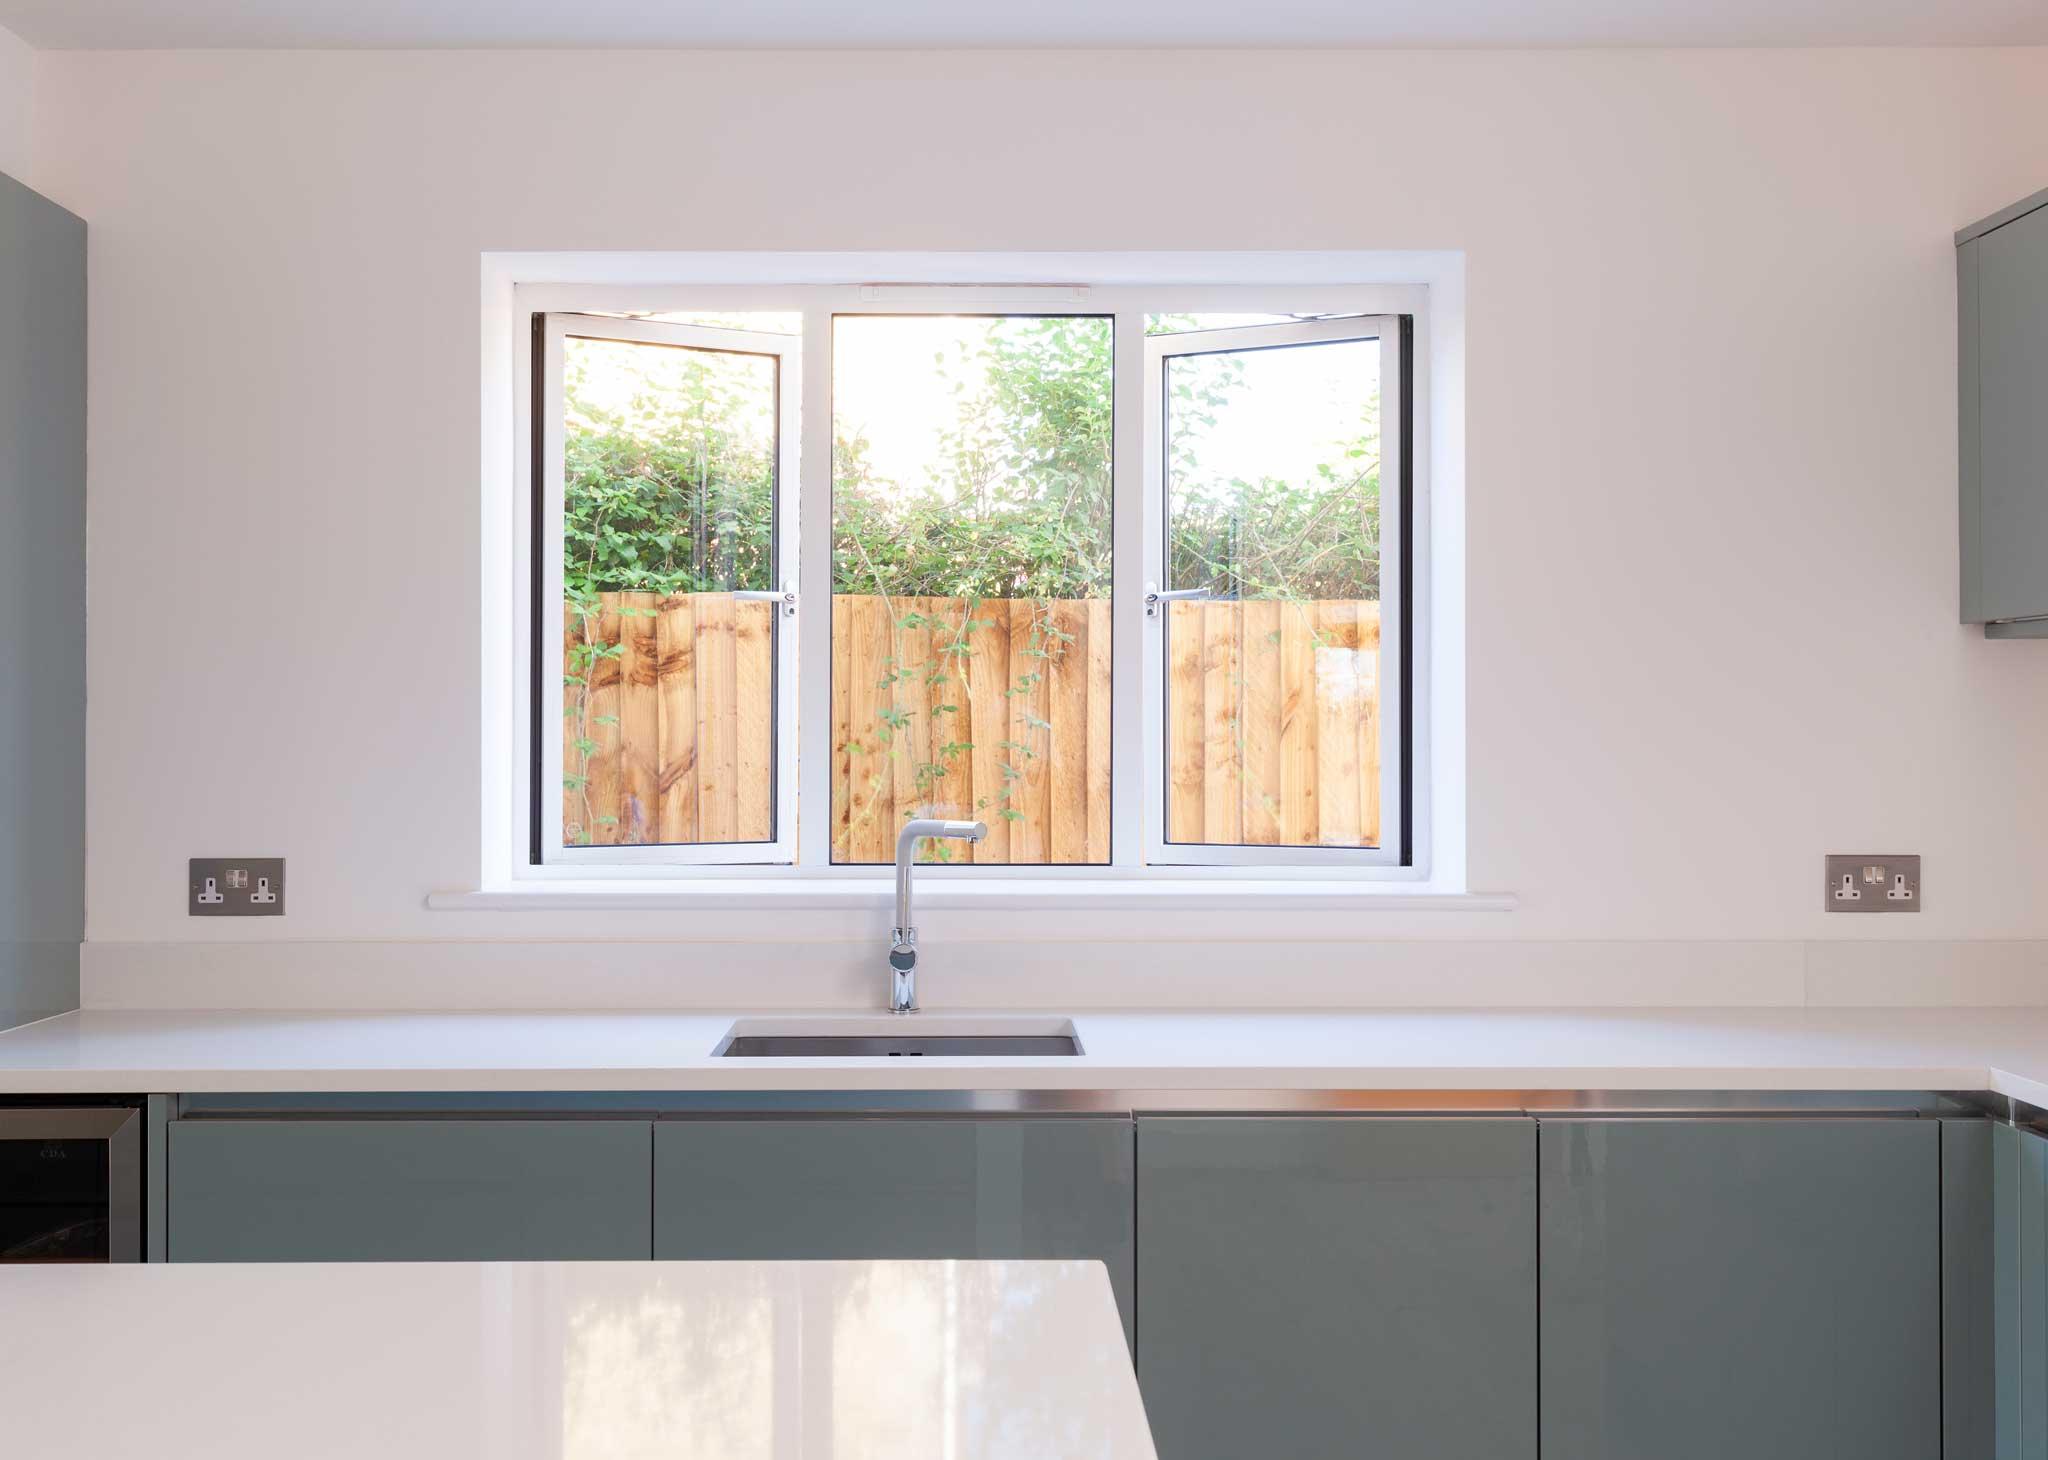 Double Glazing Window Designs in Newport